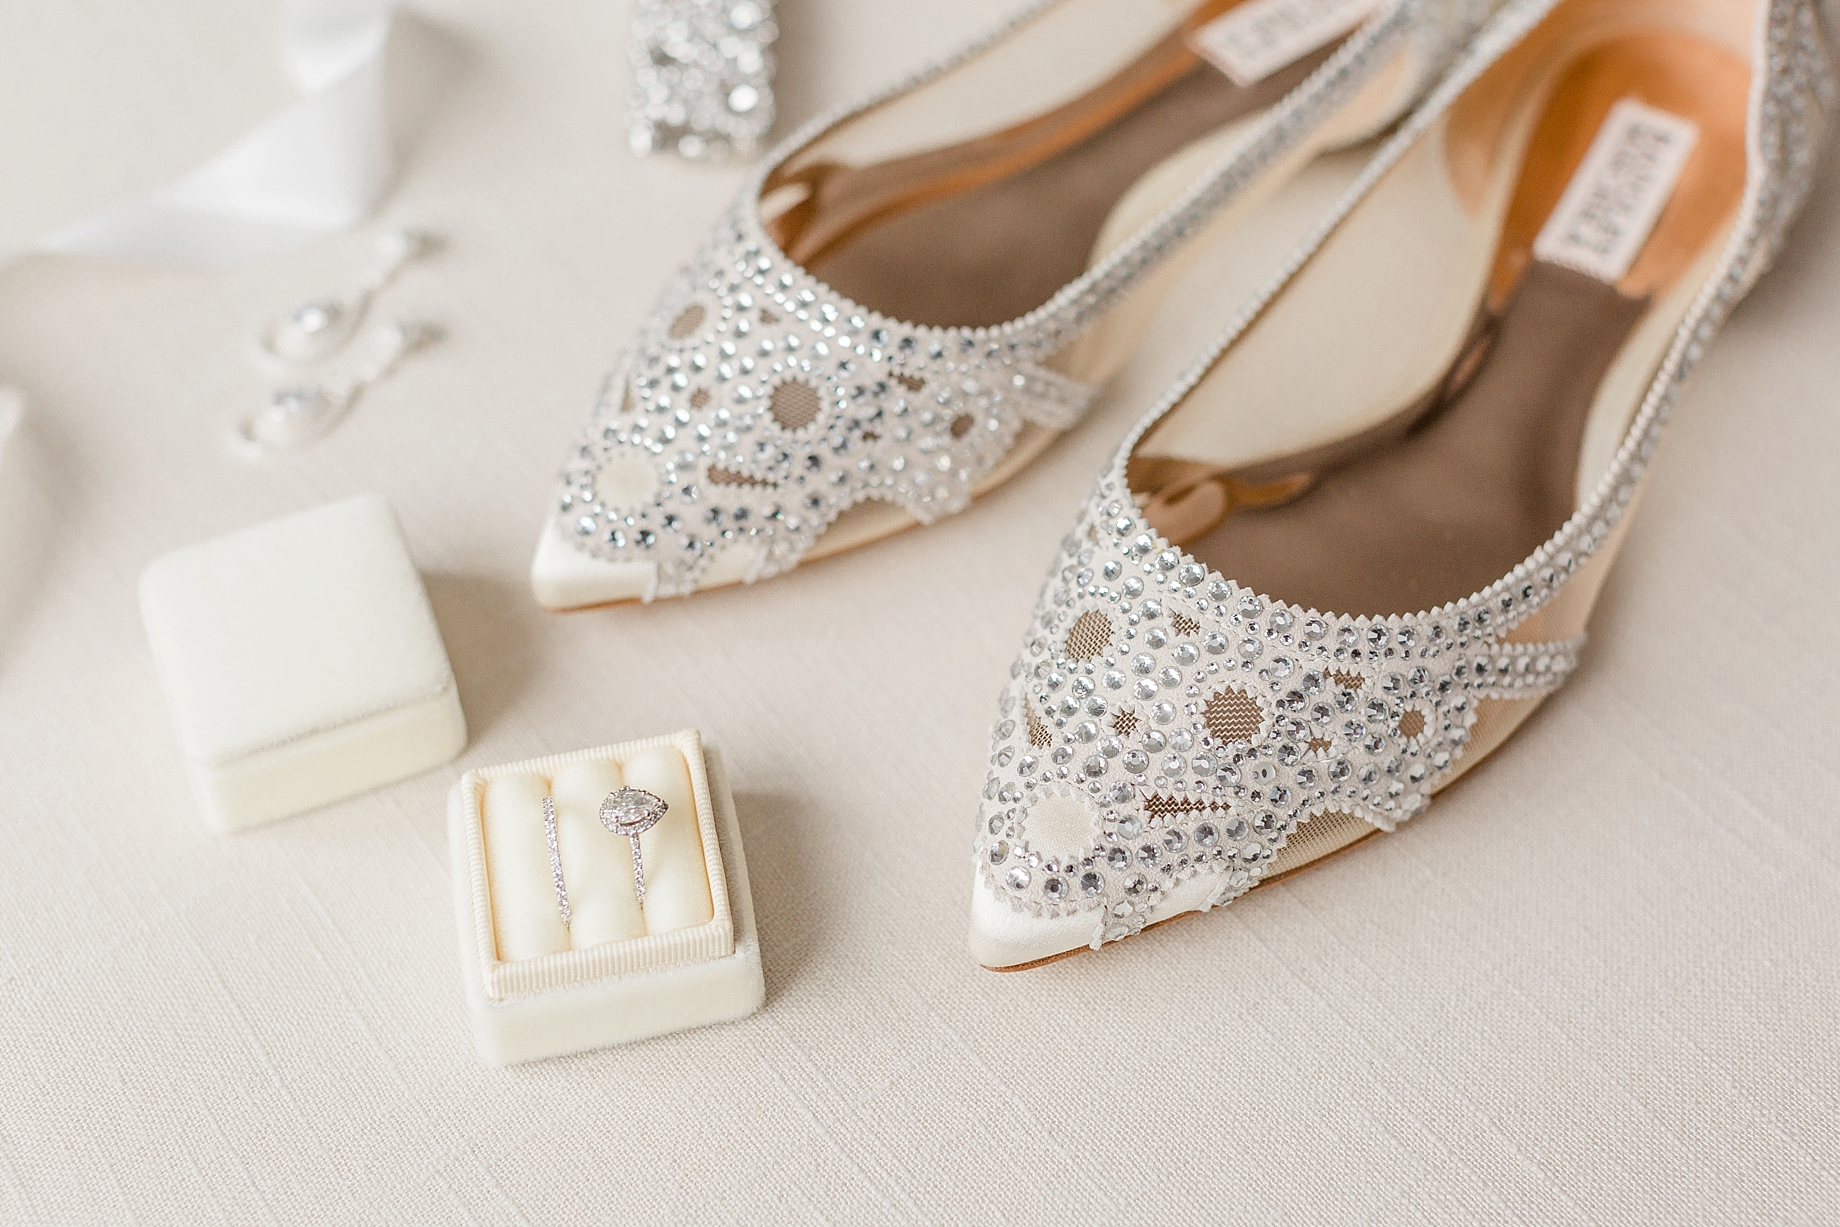 champagne bridal details   Badgley Mischka Flats   William Penn Inn Wedding